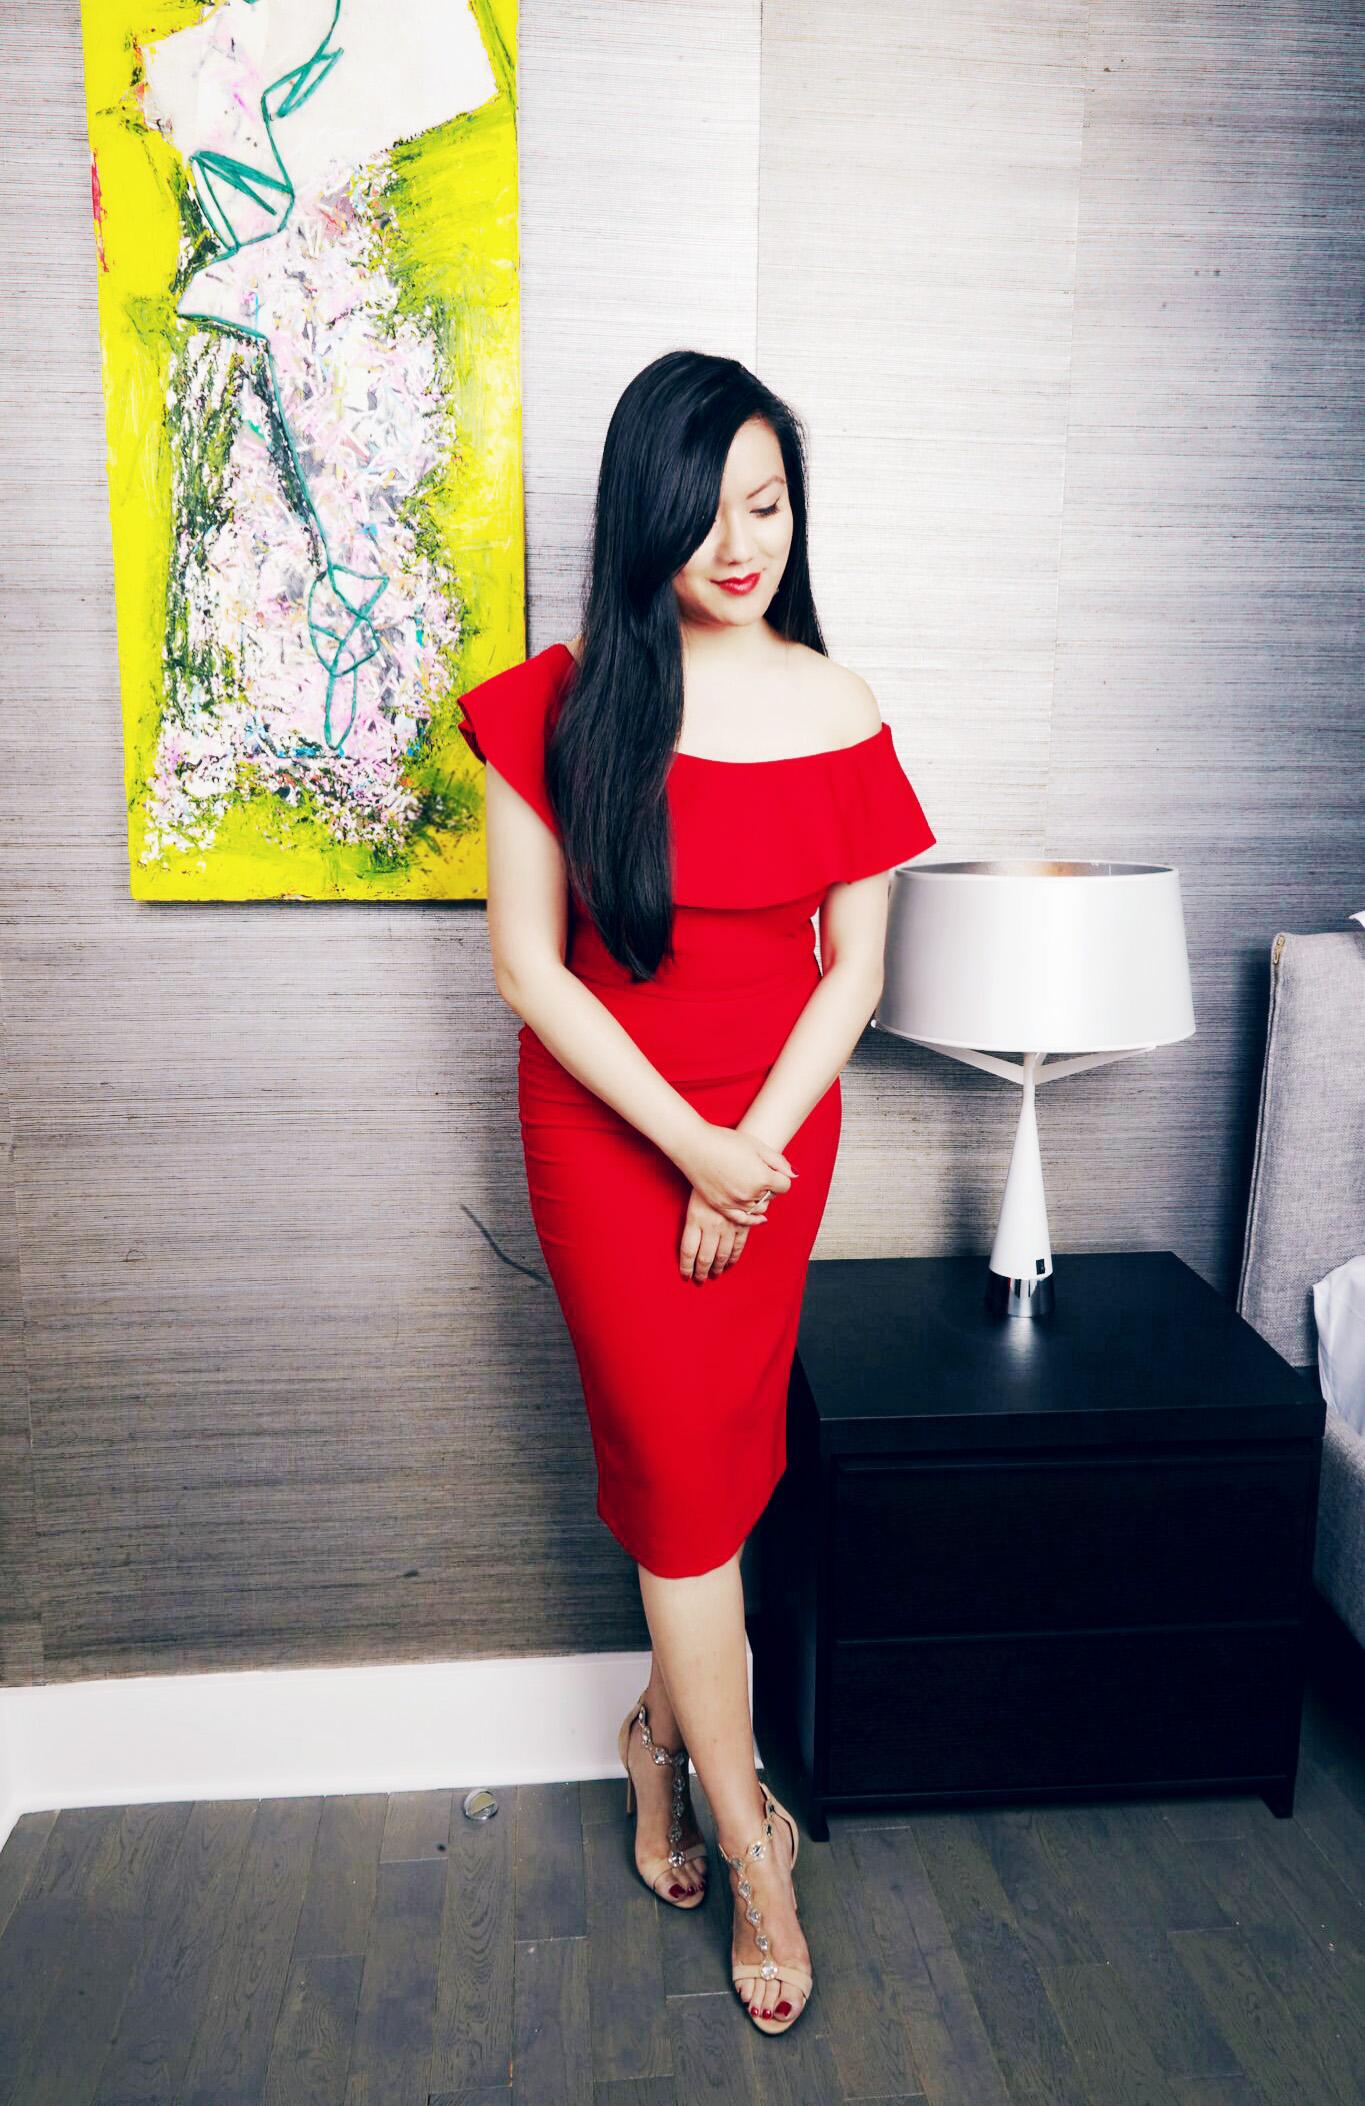 Meet 2017 Awesome Women Award Honoree Tiffany Pham  2017